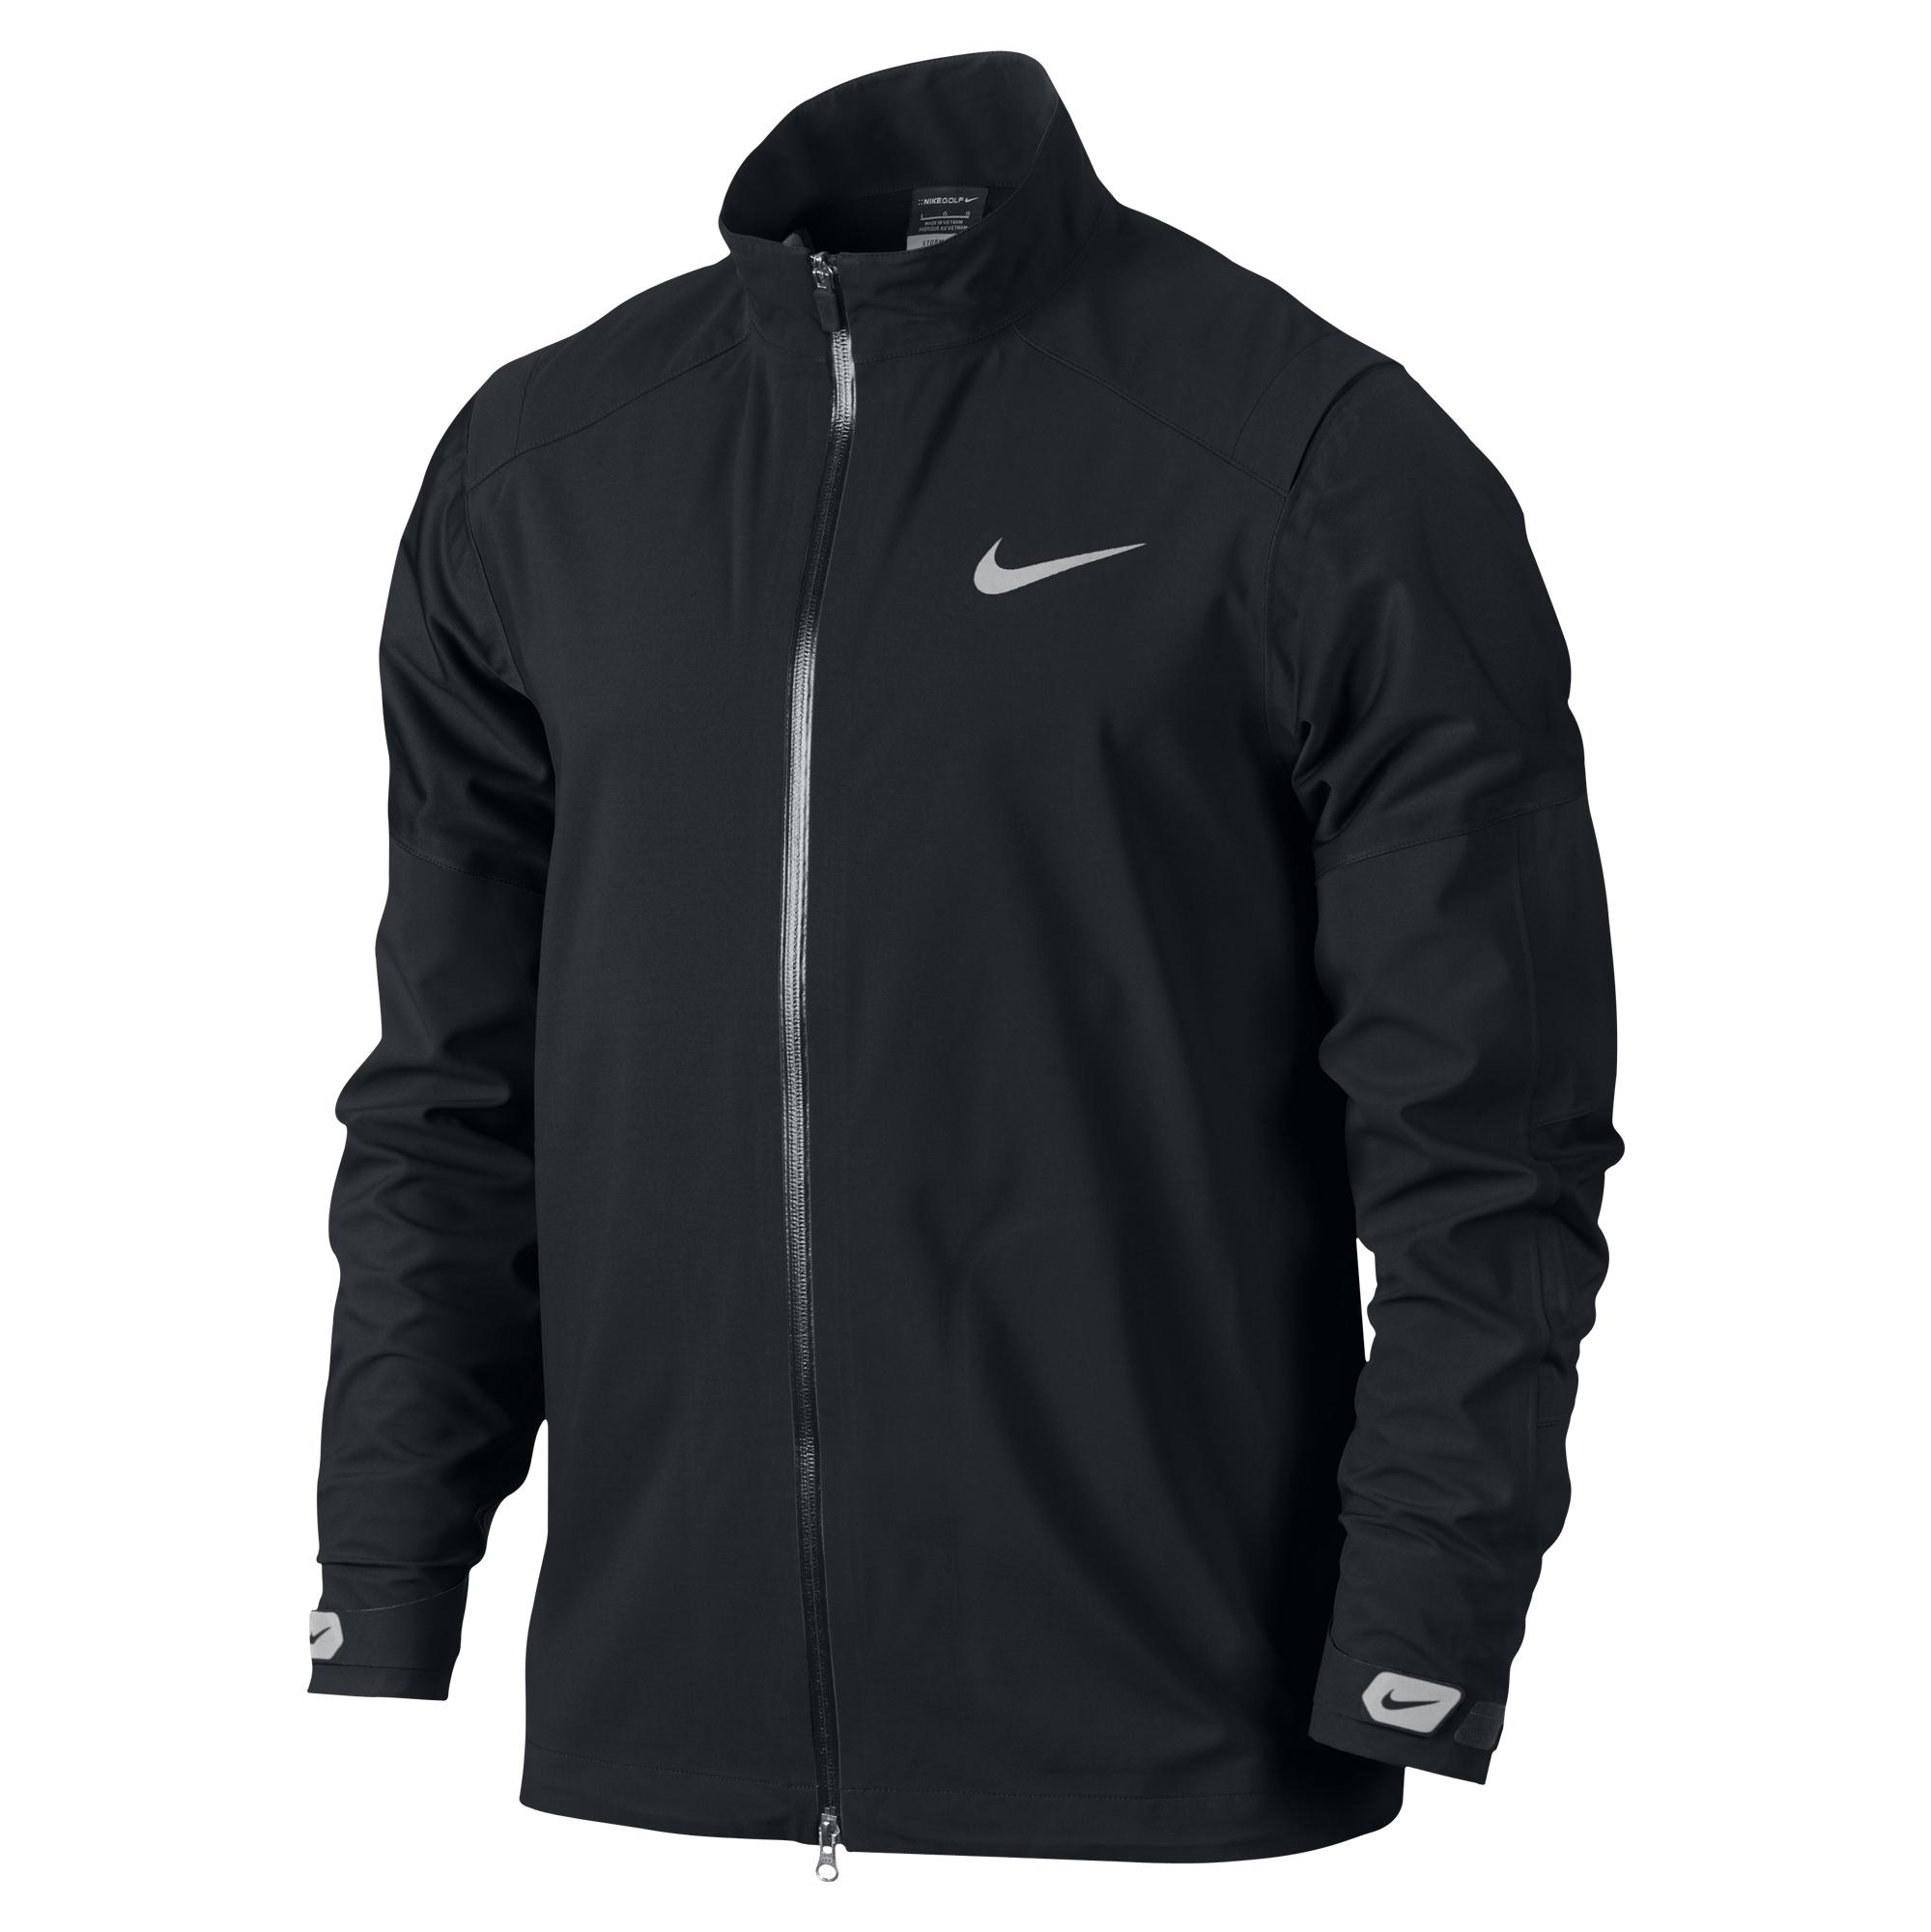 ff9bb9a80bae nike heavy jacket